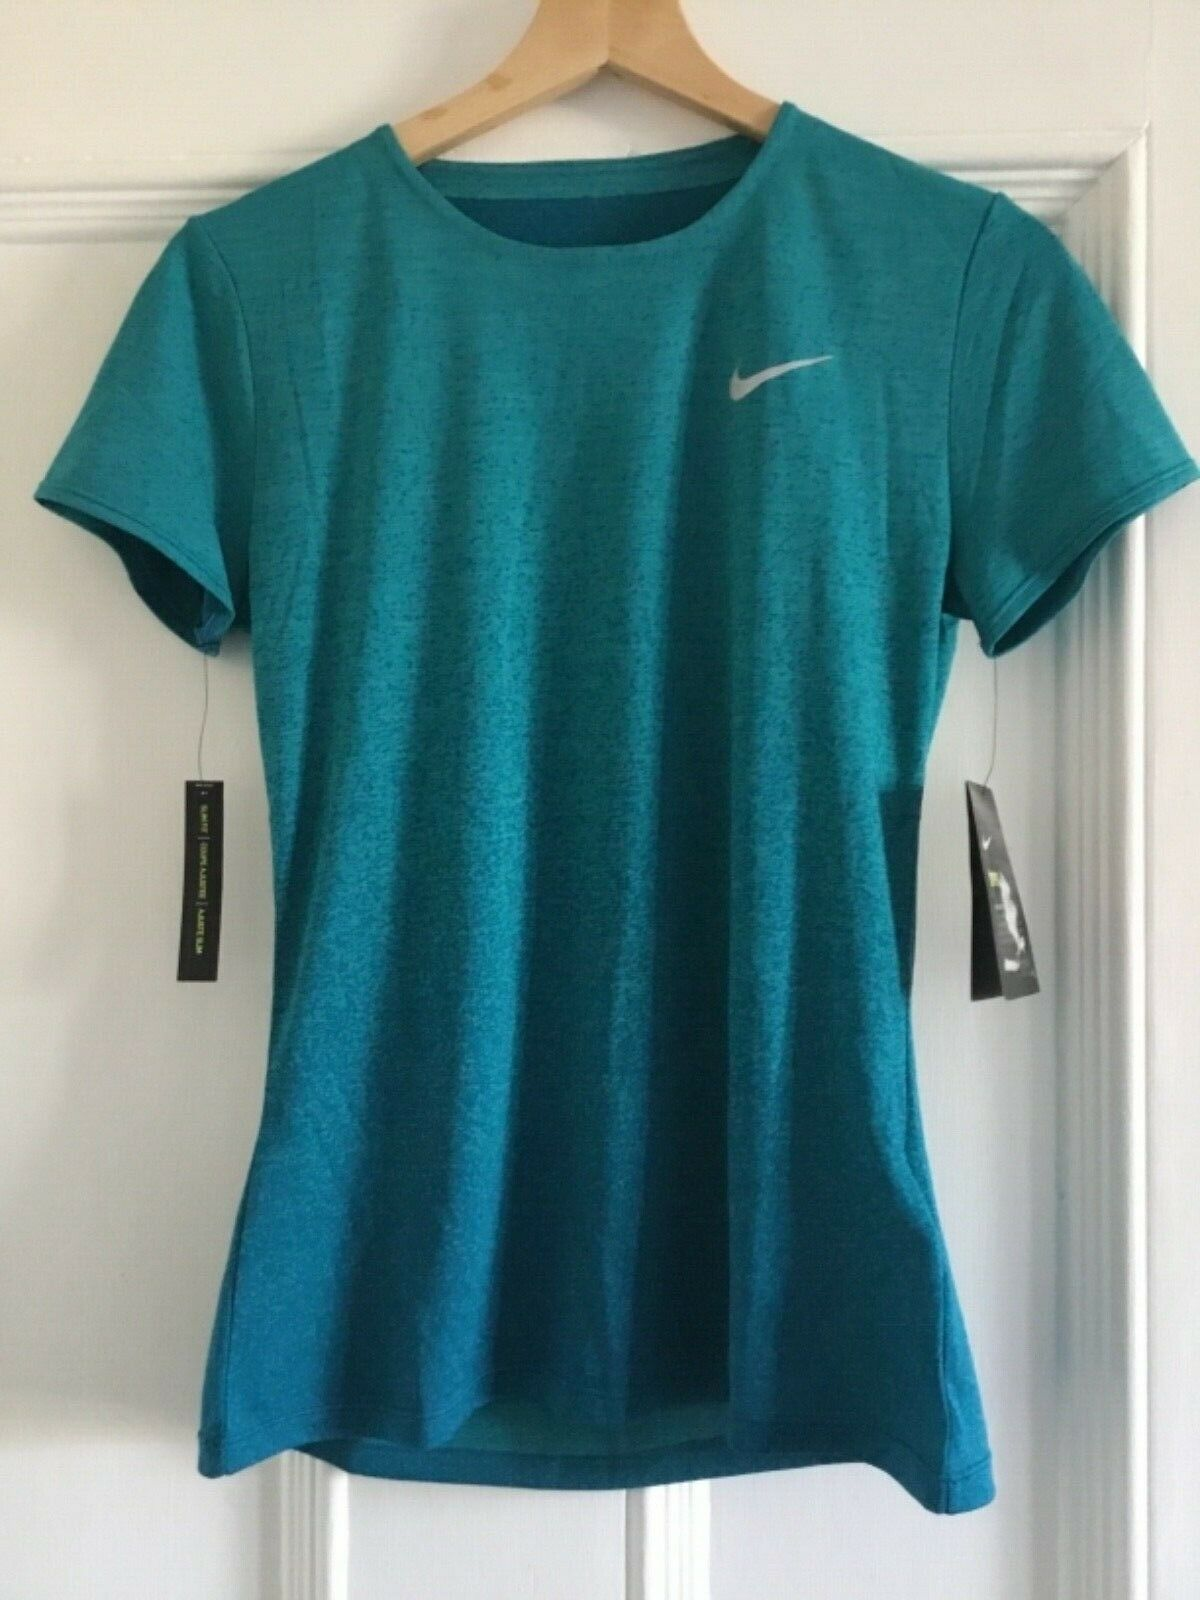 Womens NIKE DRY.  Shirt Size Small 928950-317